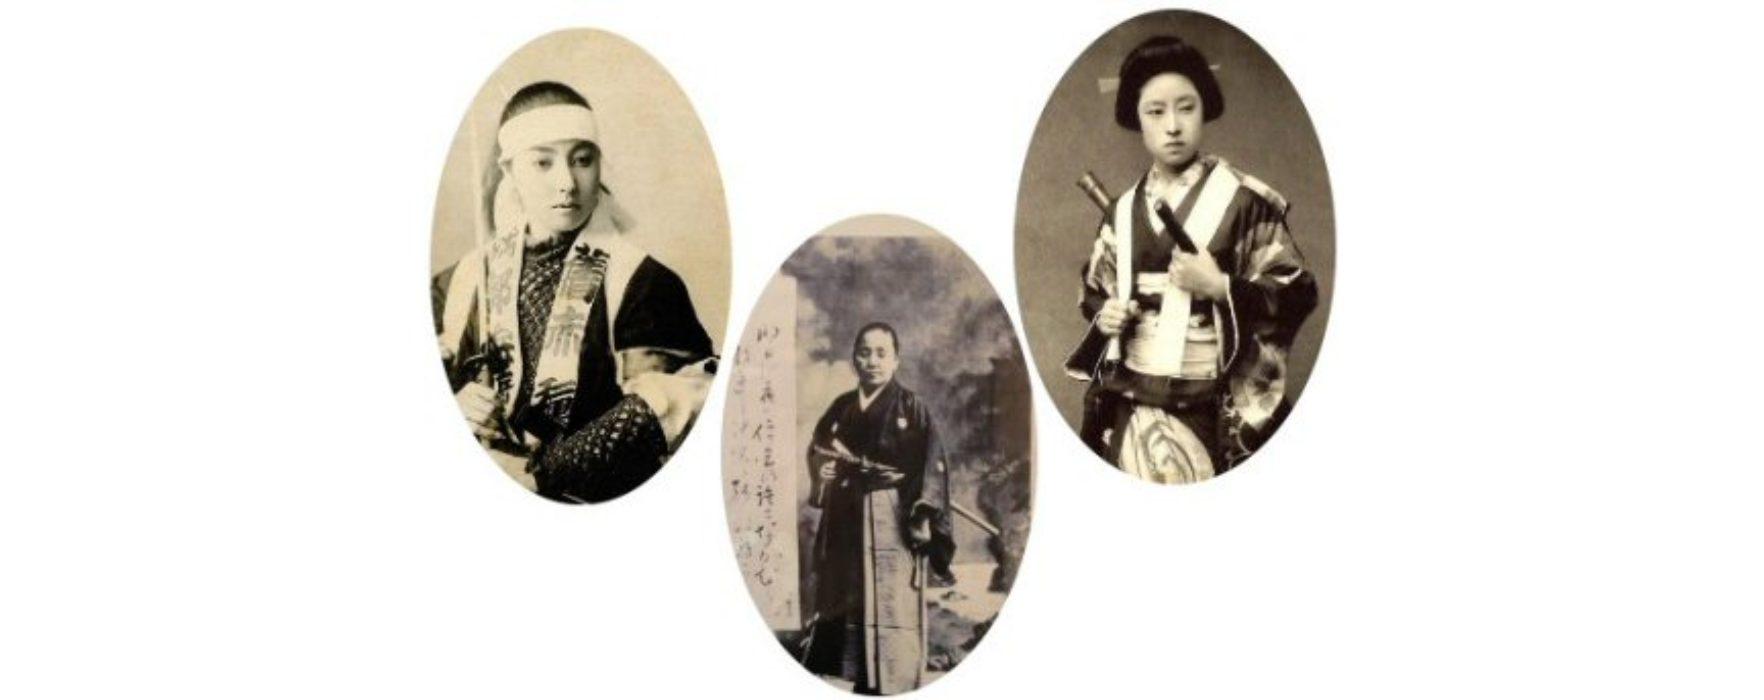 Onna-bugeisha, 女武芸者